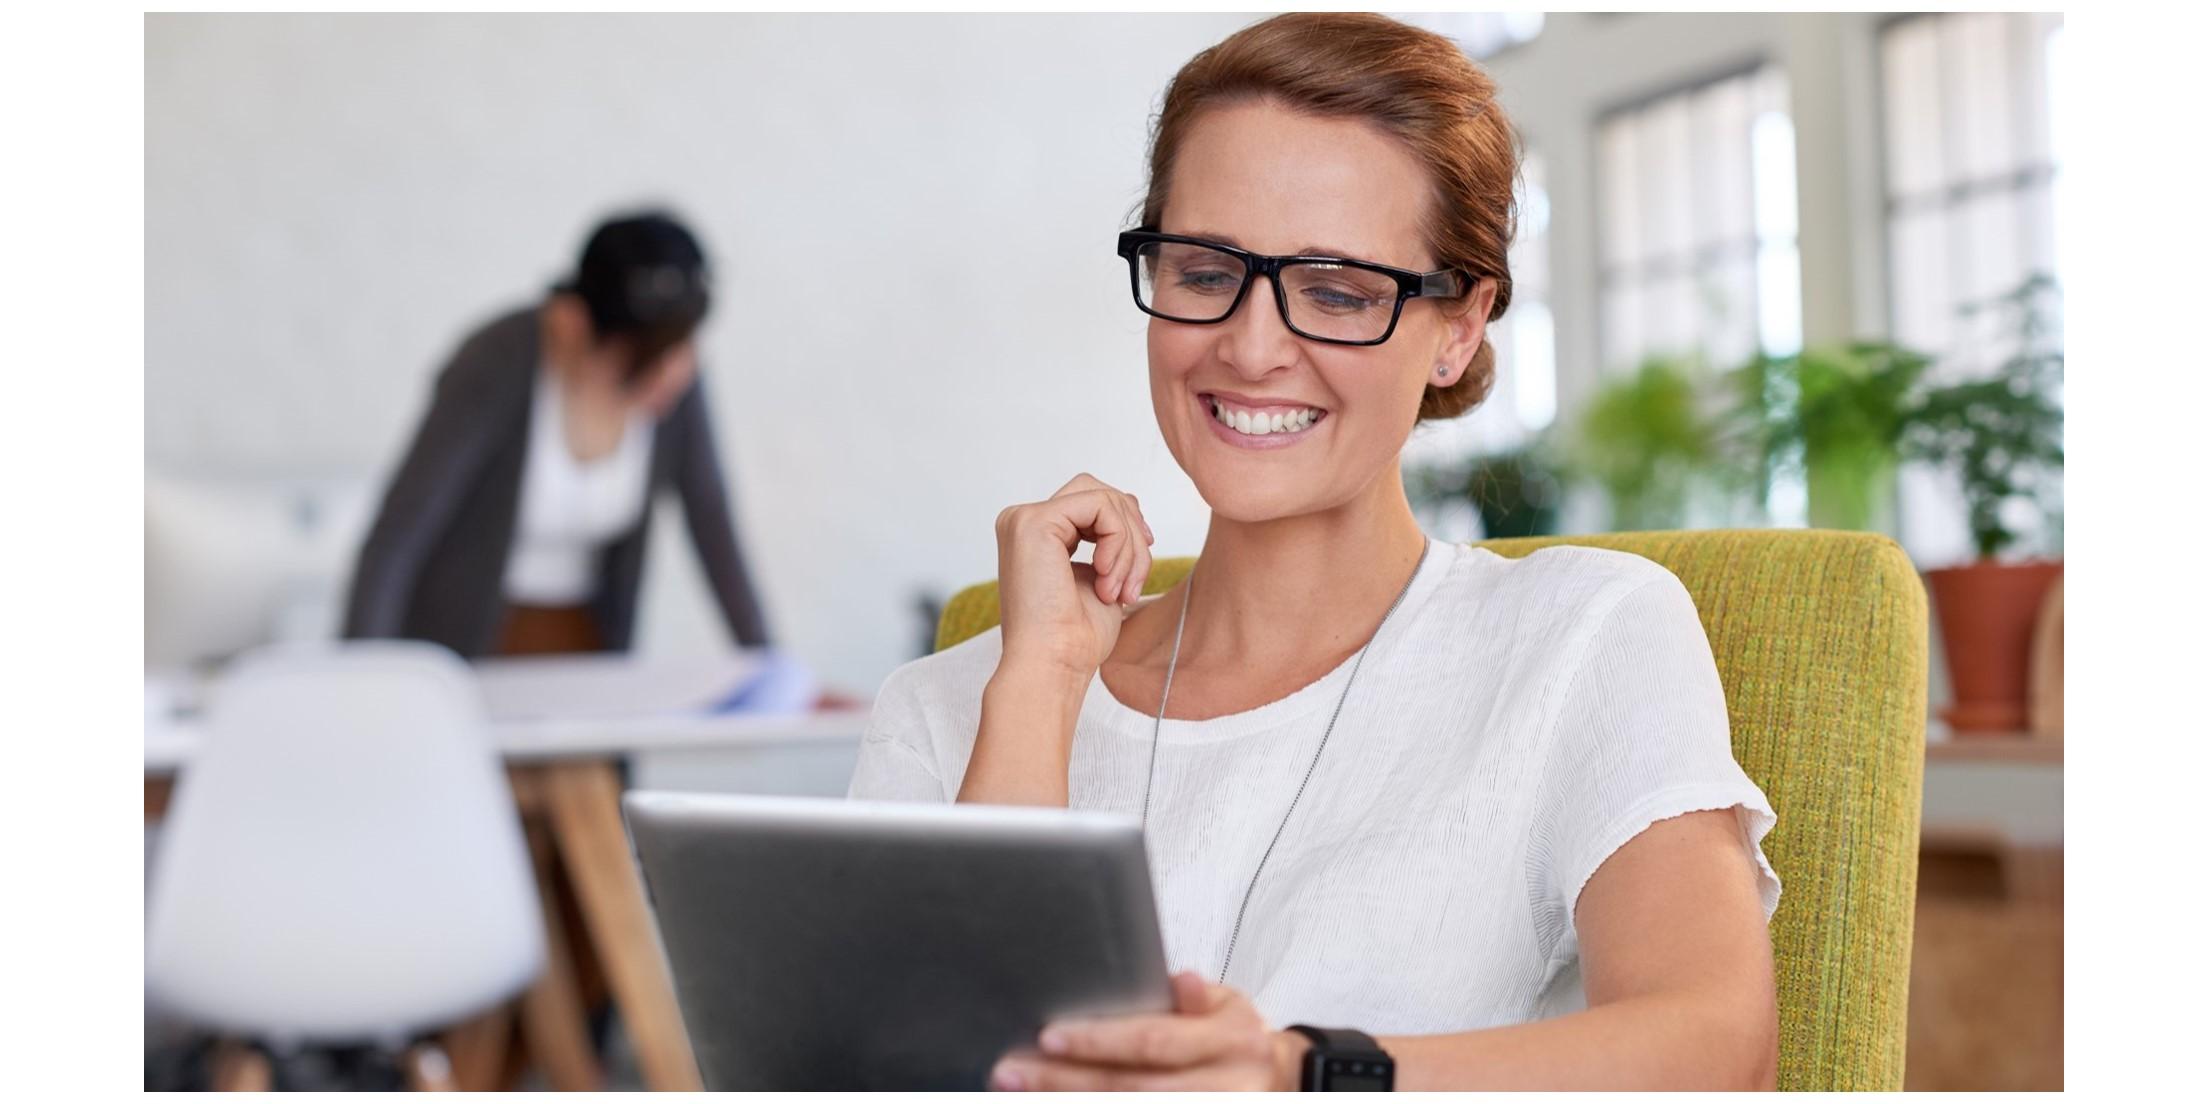 e-Learning for Retail - Holland & Barrett